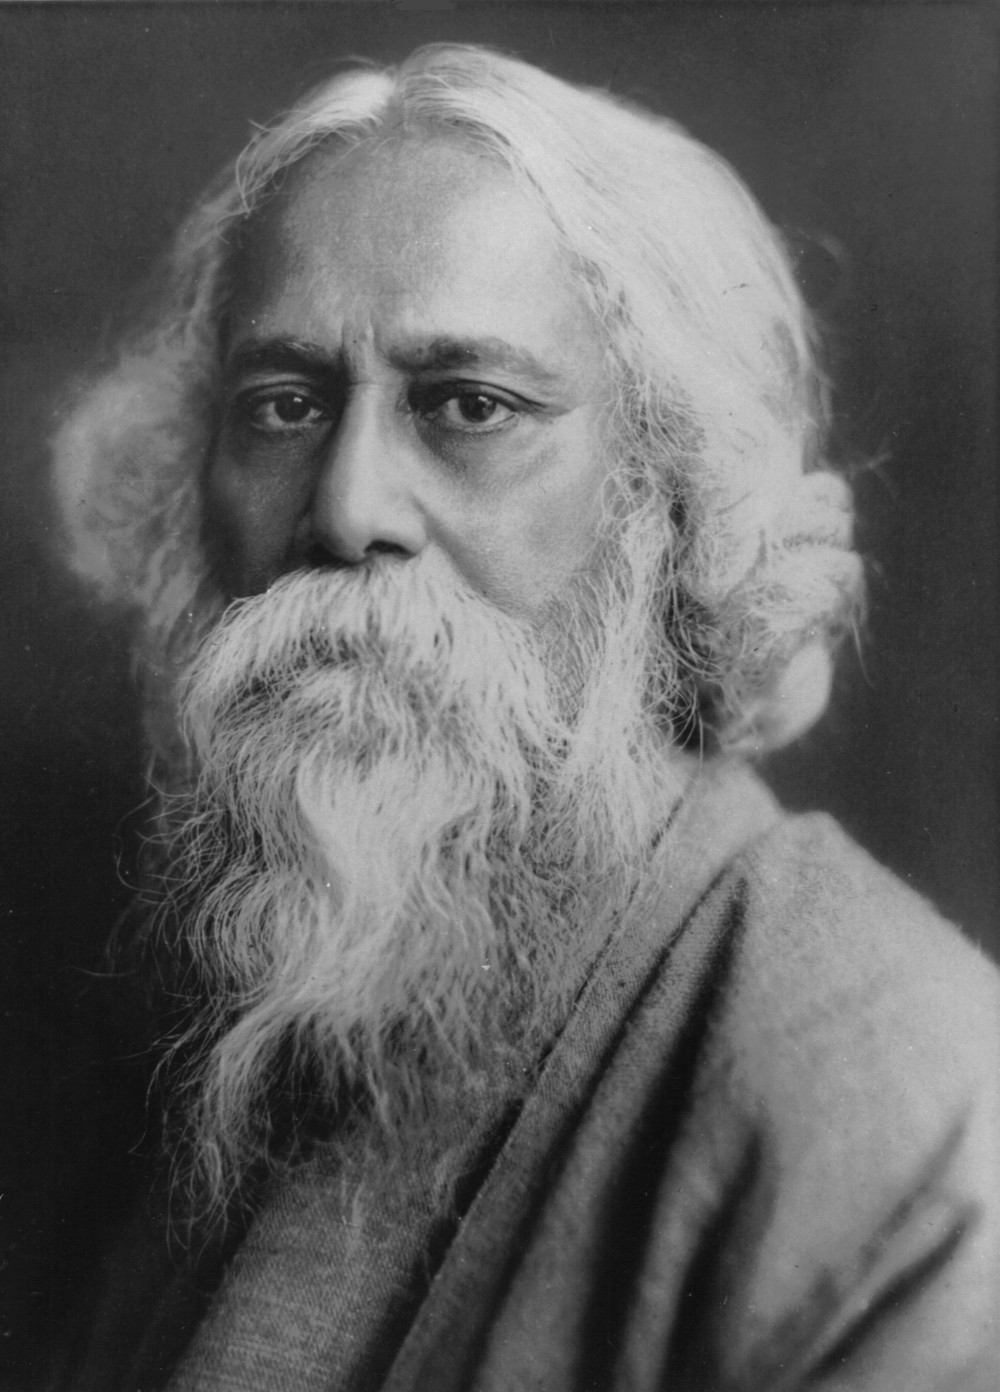 Rabindranath Tagore (Source: Wikimedia Commons)